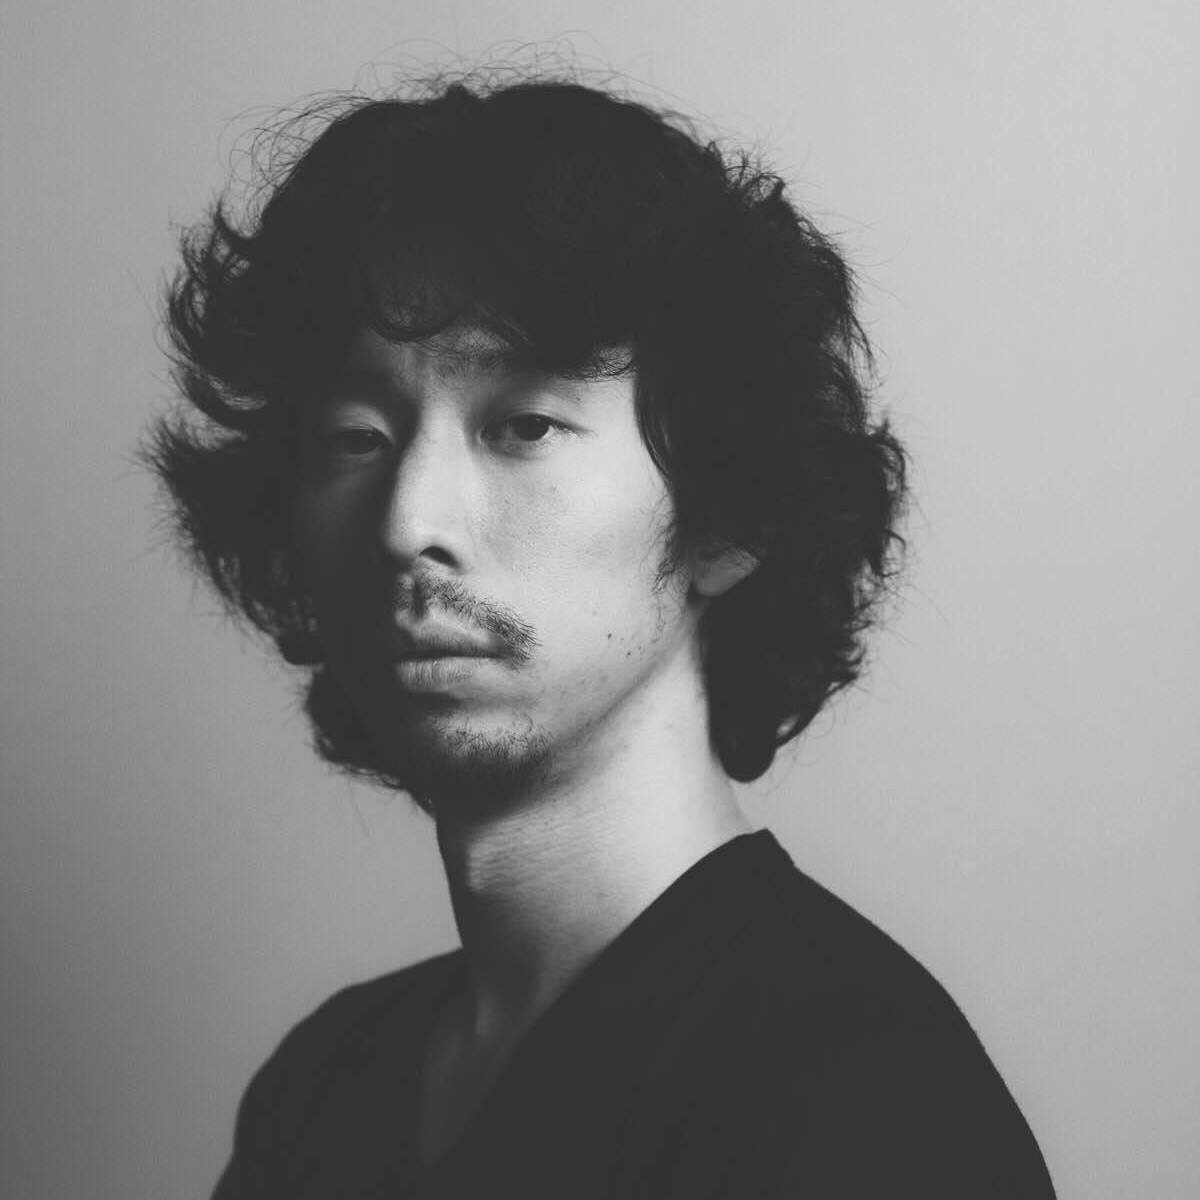 Artisti in residenza - Kensuke Koike